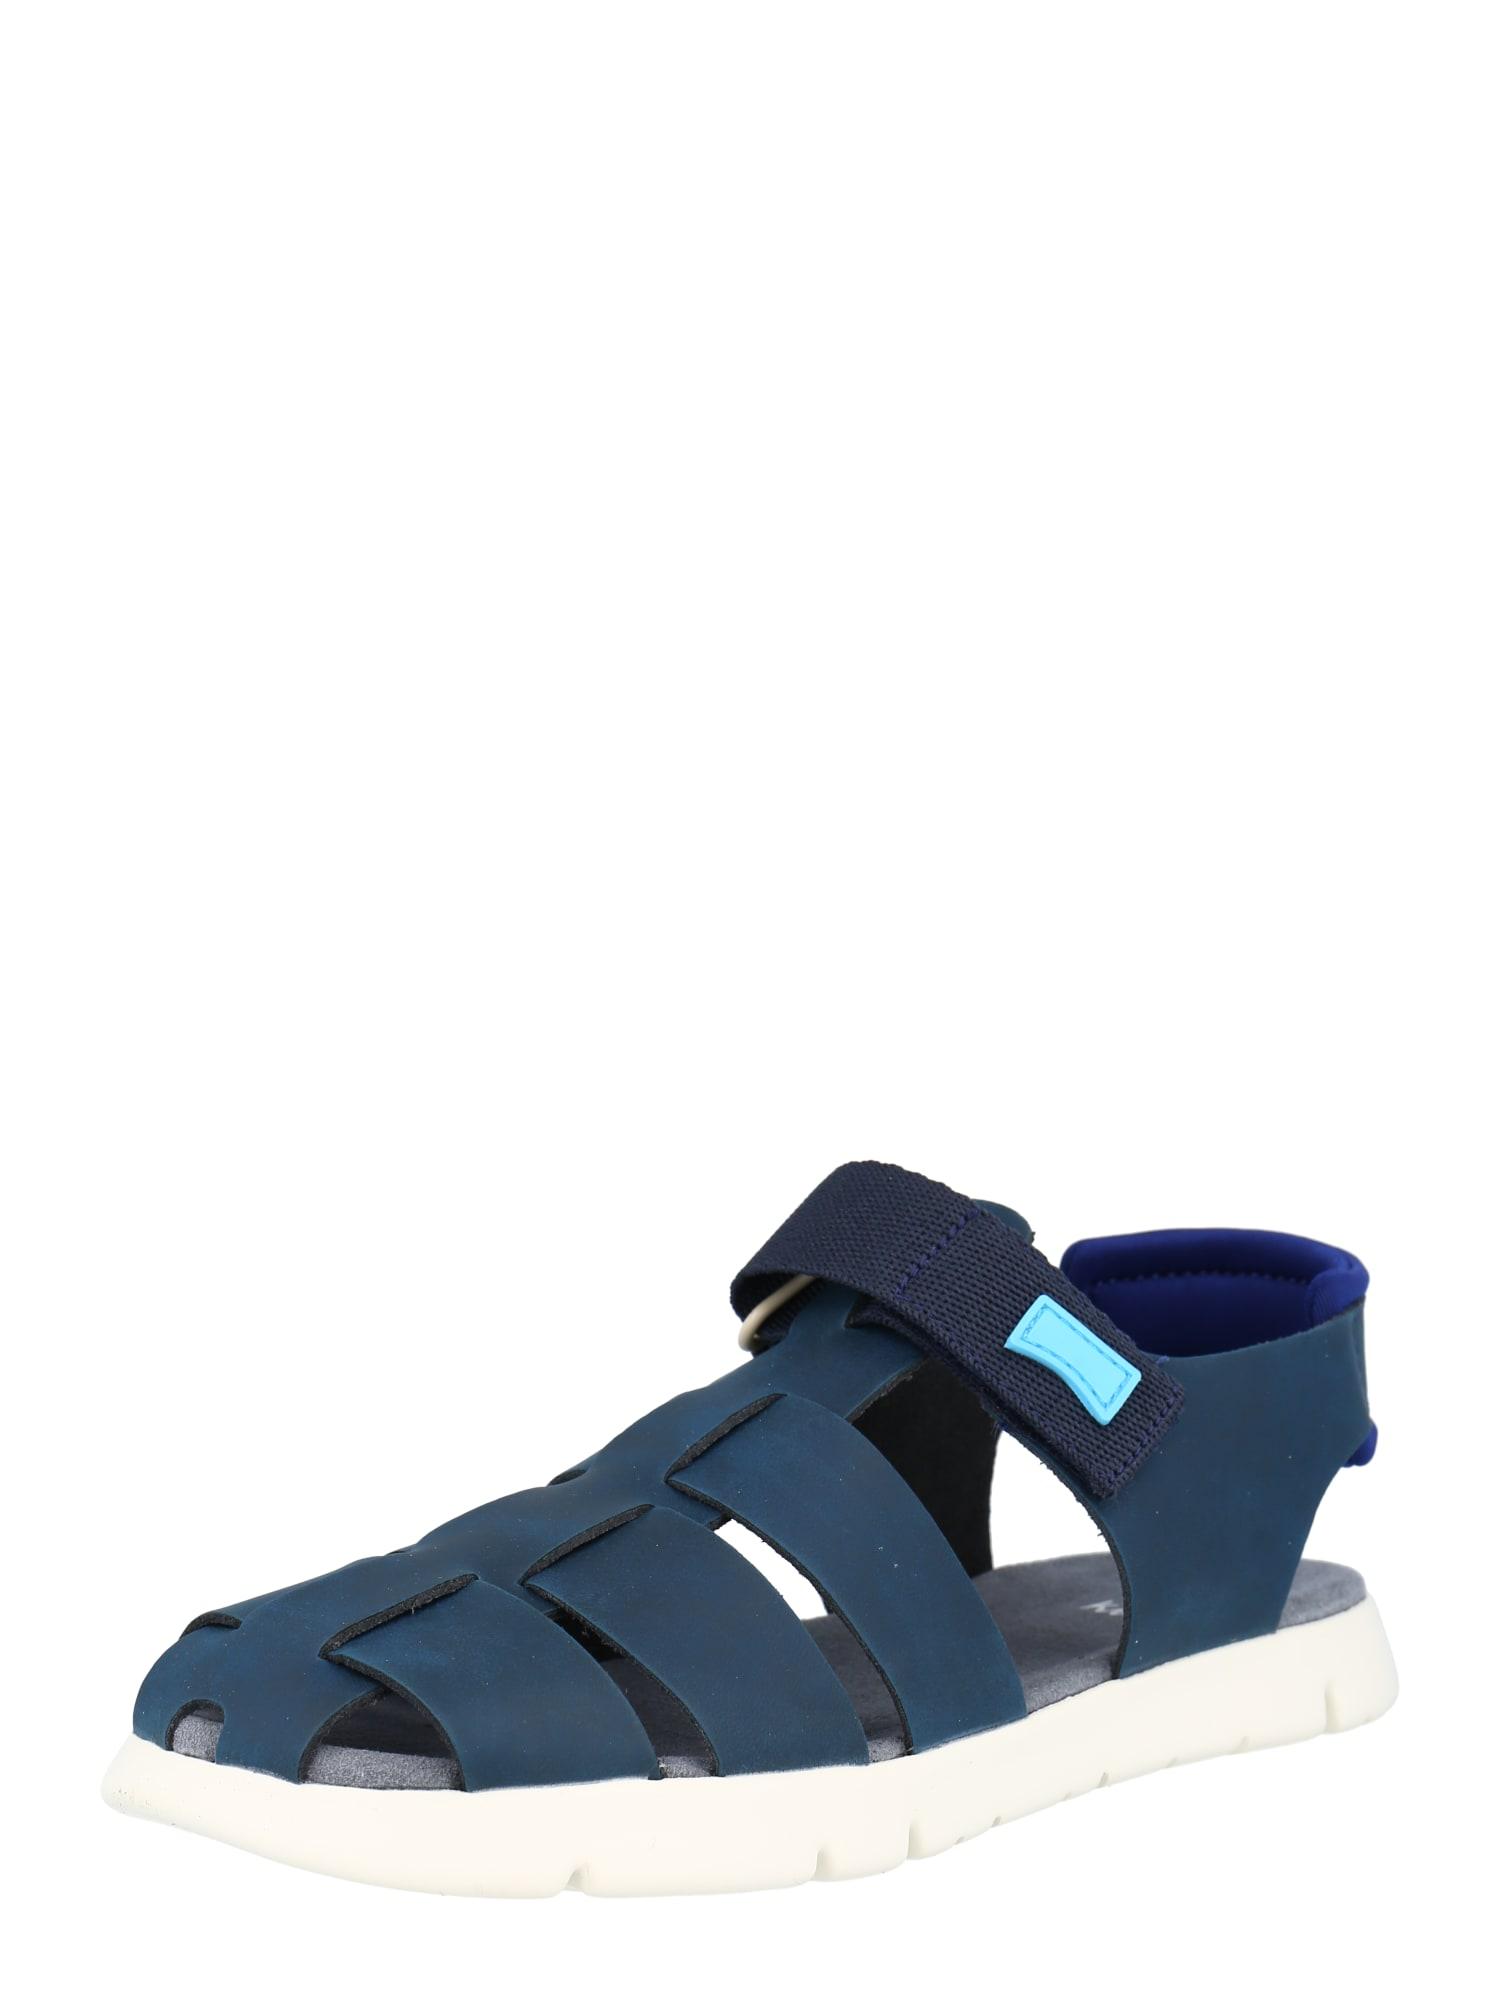 CAMPER Atviri batai